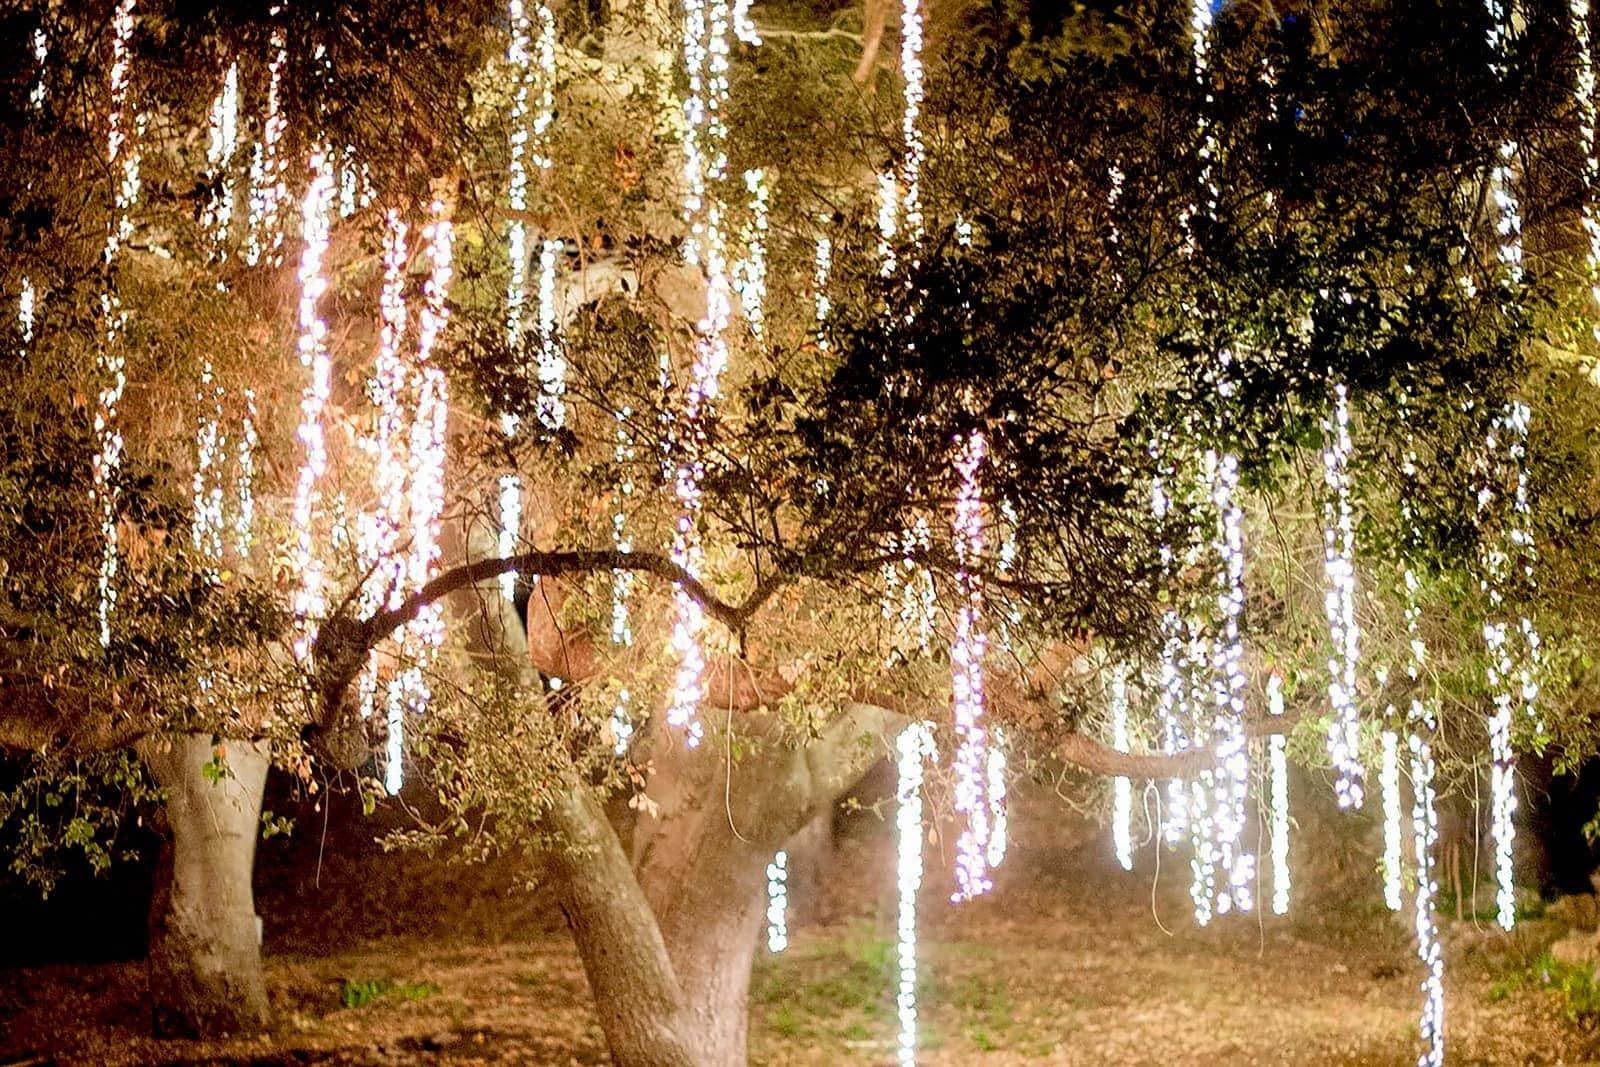 Koppelbare Clusterverlichting Warm Wit 120 Led Lampjes